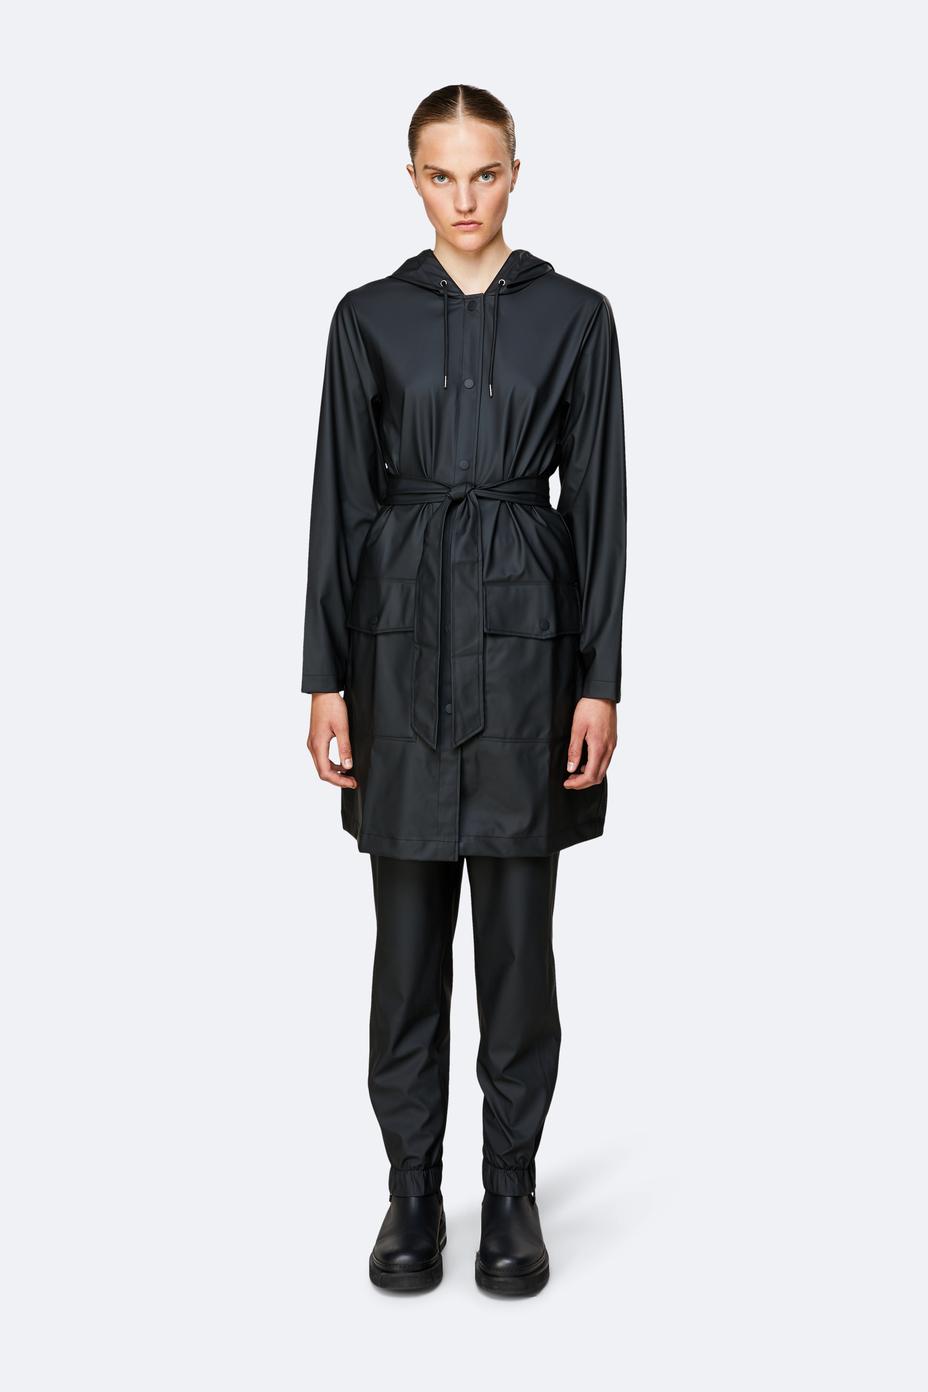 Rains Belt Jacket regnjakke, sort, large/x-large